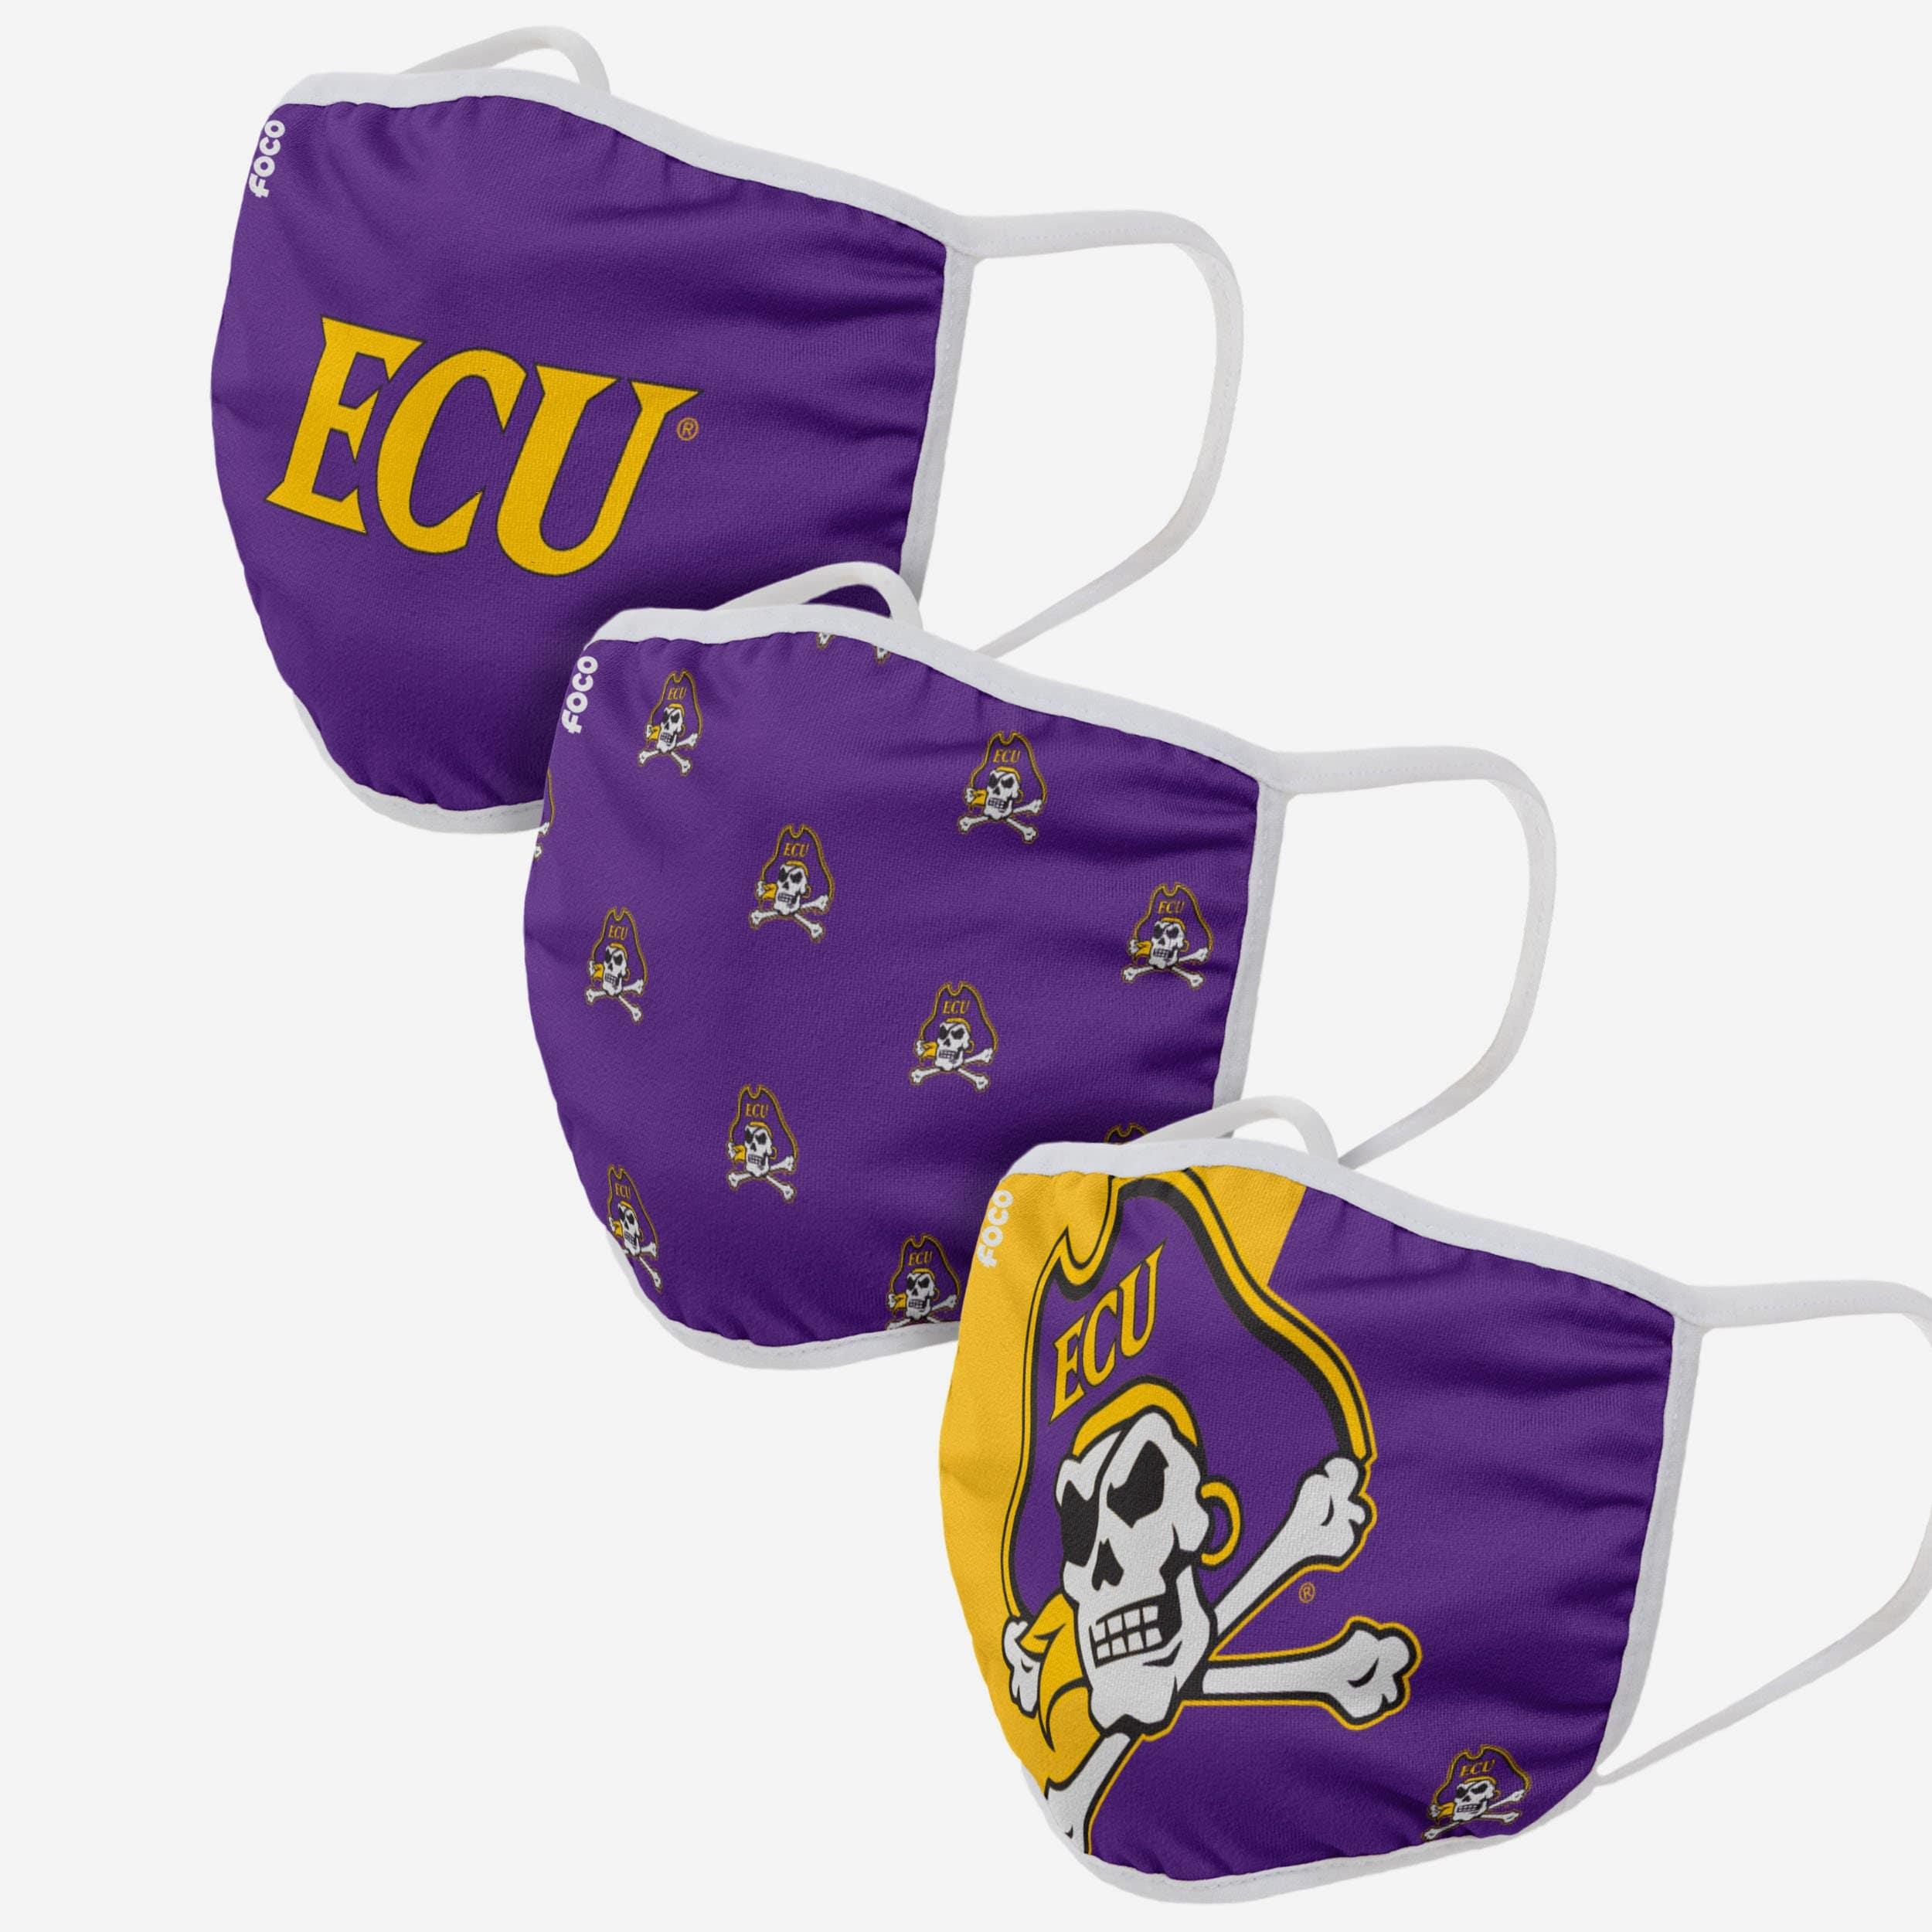 FOCO East Carolina Pirates 3 Pack Face Cover